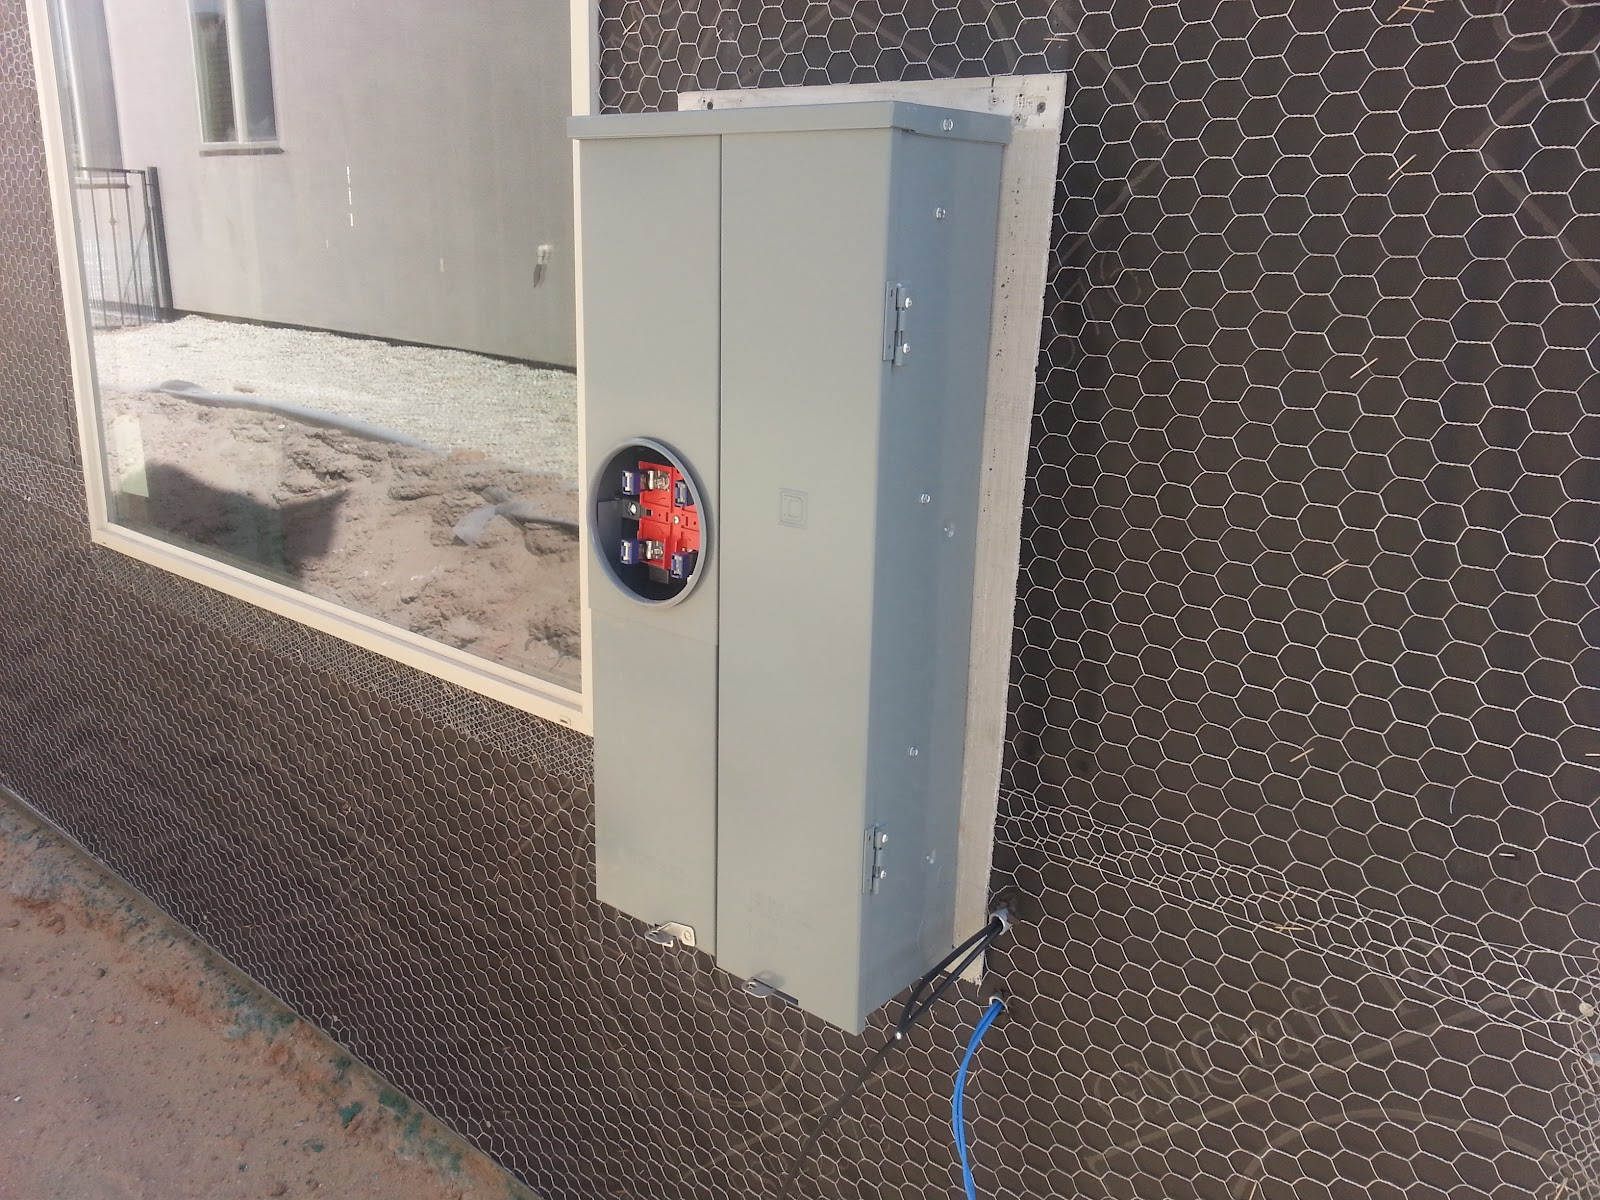 Mike B. Christensen: Week 6, 7, and 8 - HVAC, Plumbing, Electrical